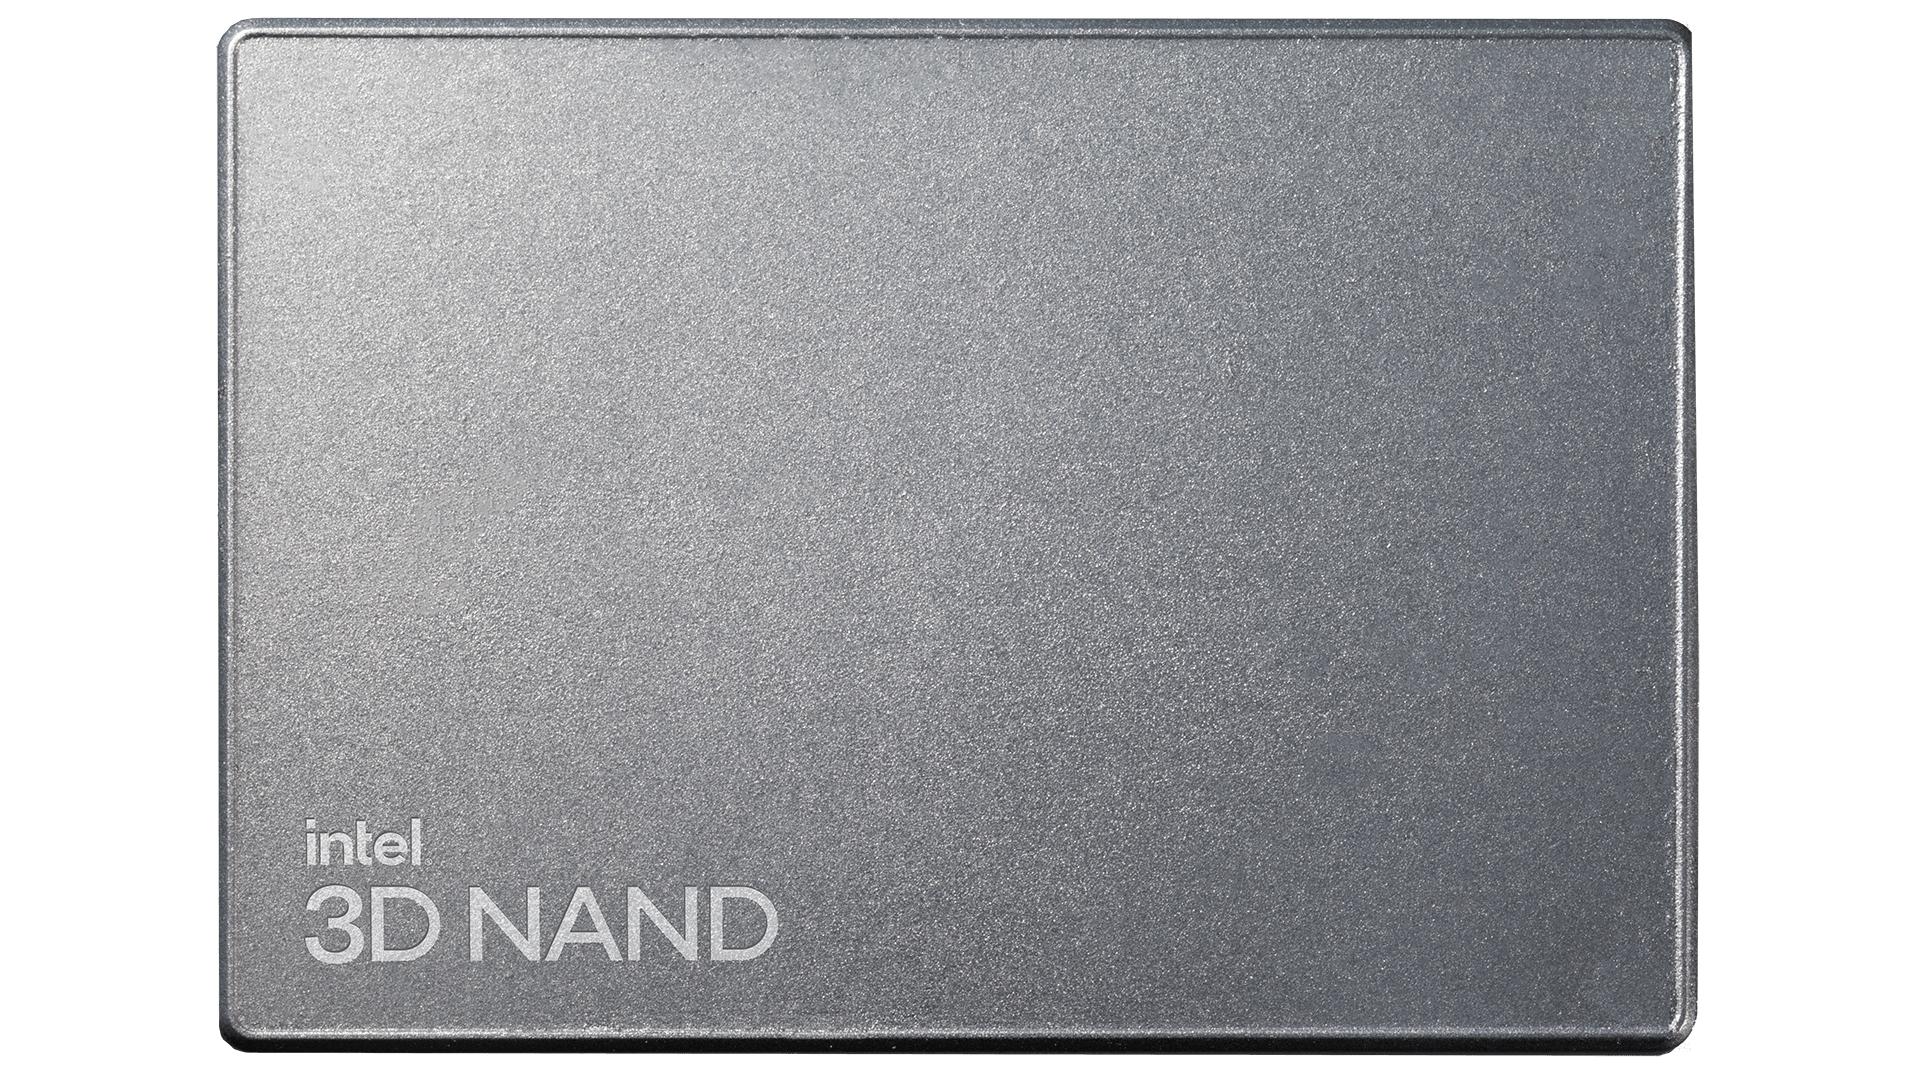 Intel D7 -P5510 43 3840 GB PCI Express 4.0 3D TLC NAND NVMe